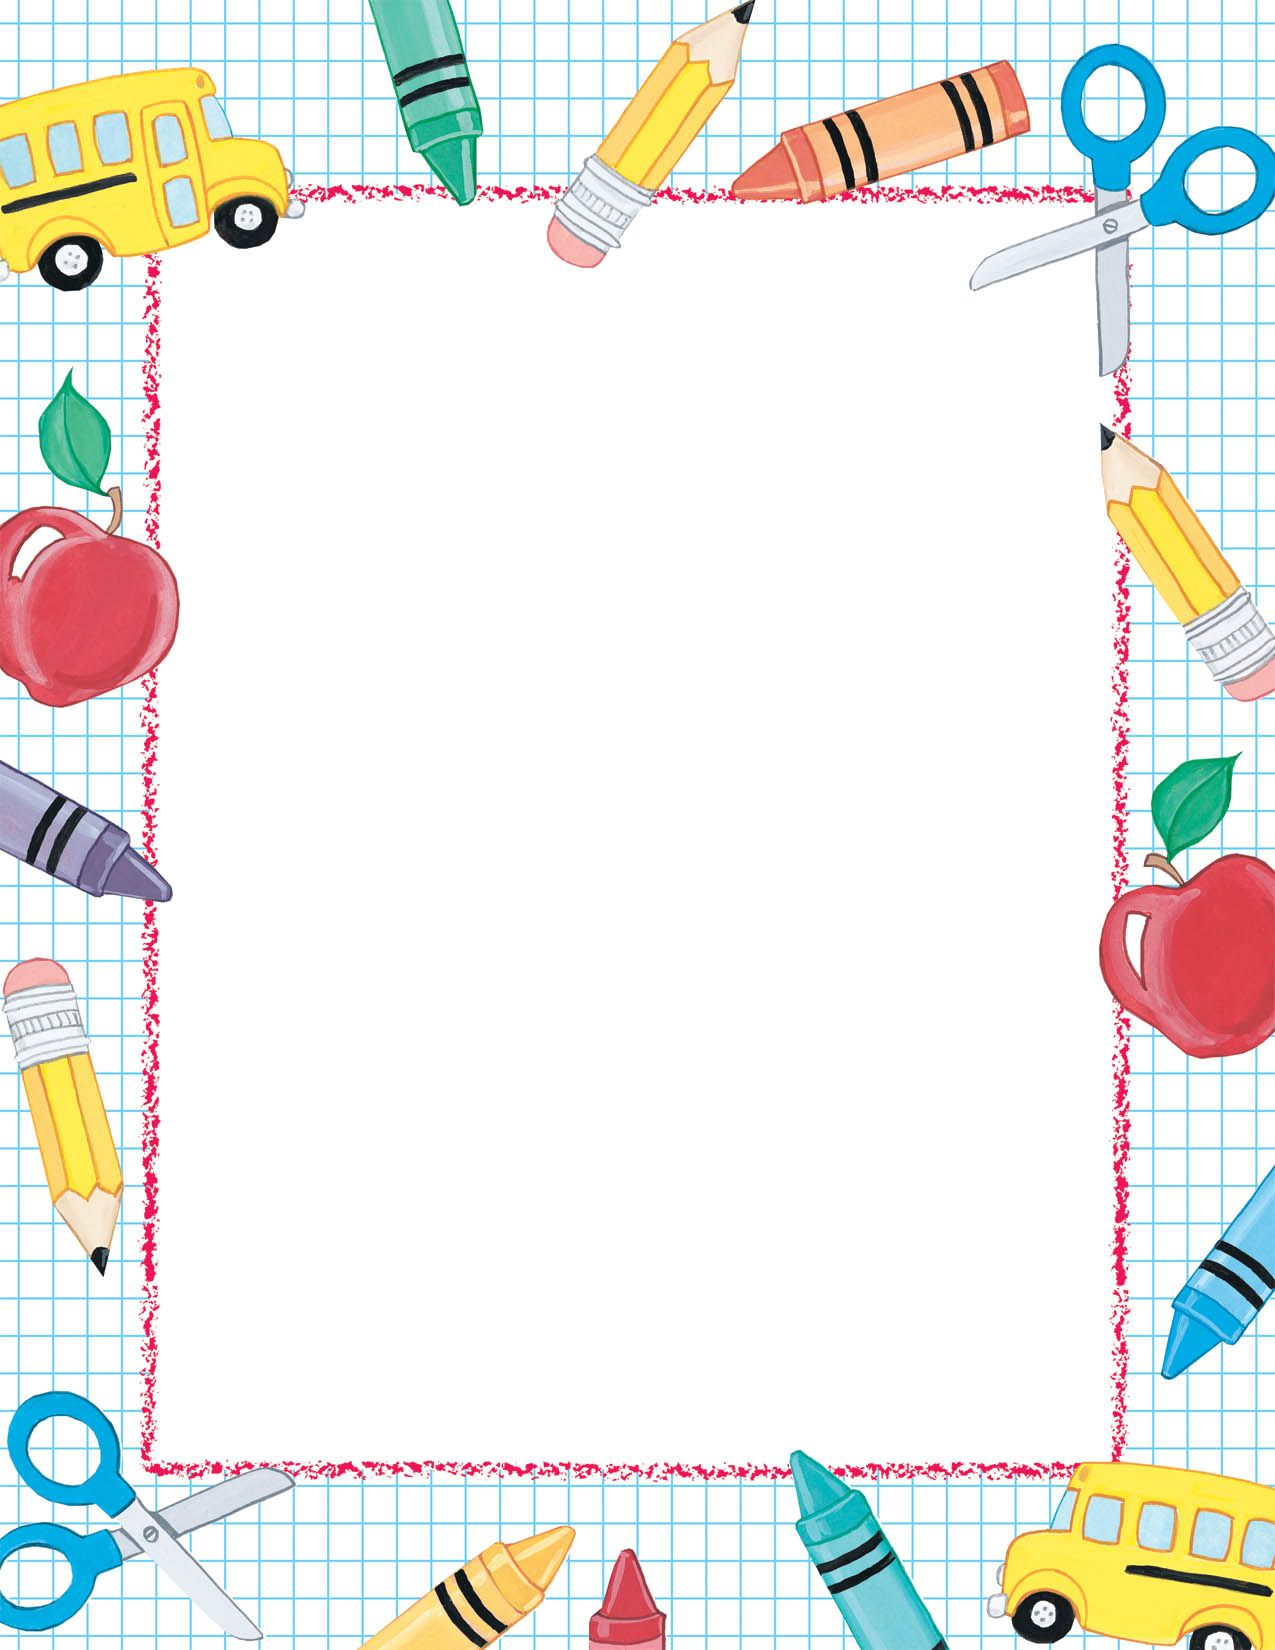 Curriculum clipart school papers. Escolar fondos borders for